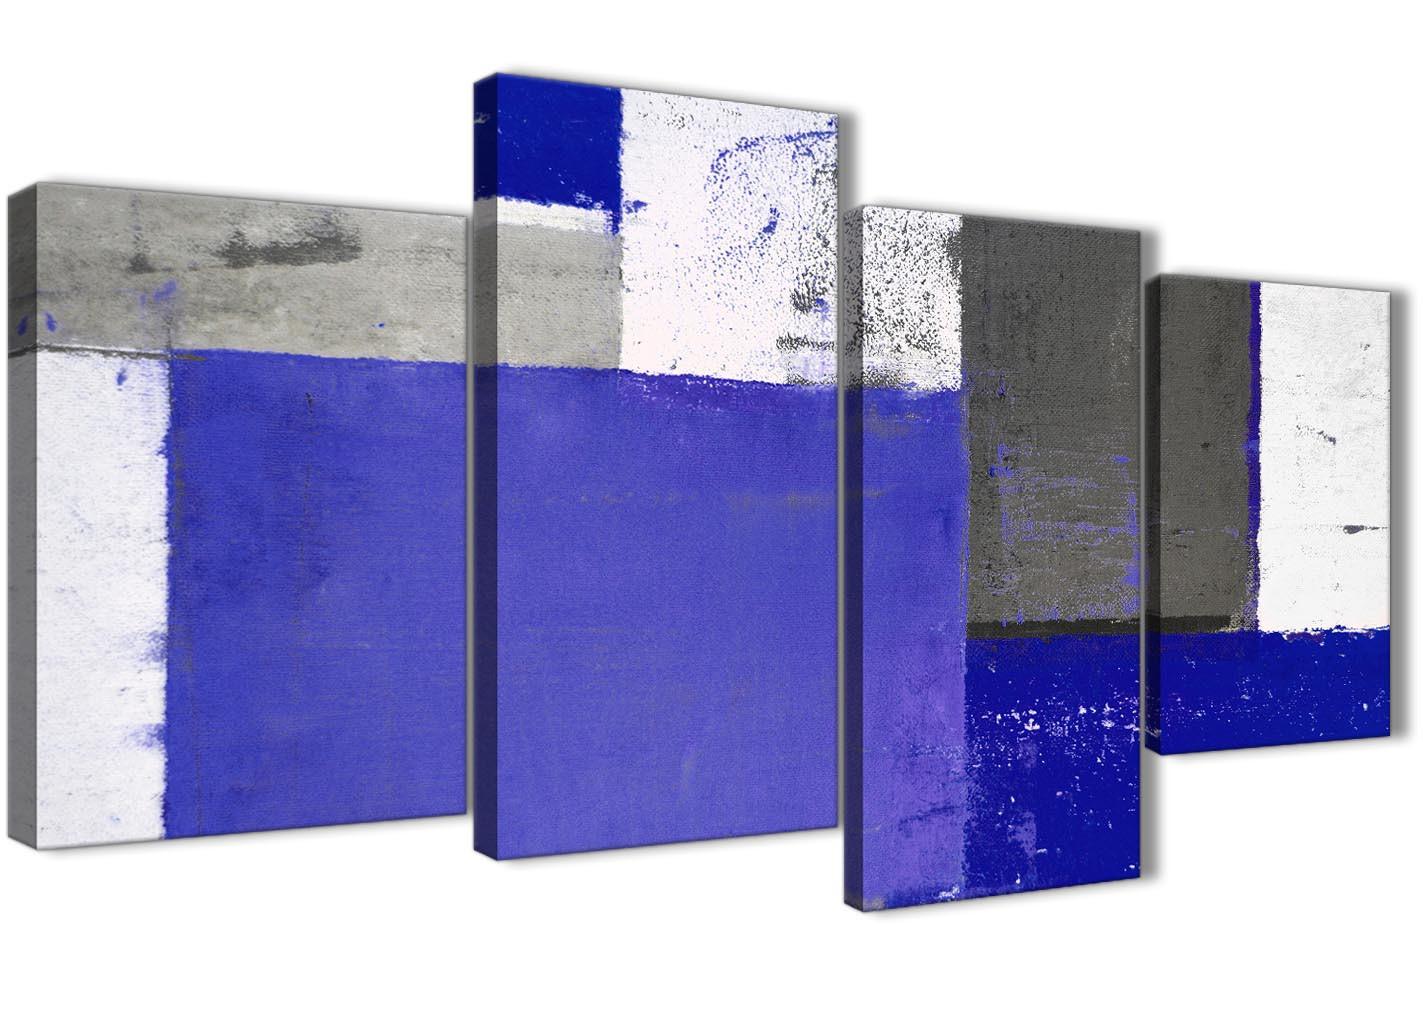 Large Indigo Navy Blue Abstract Painting Canvas Wall Art